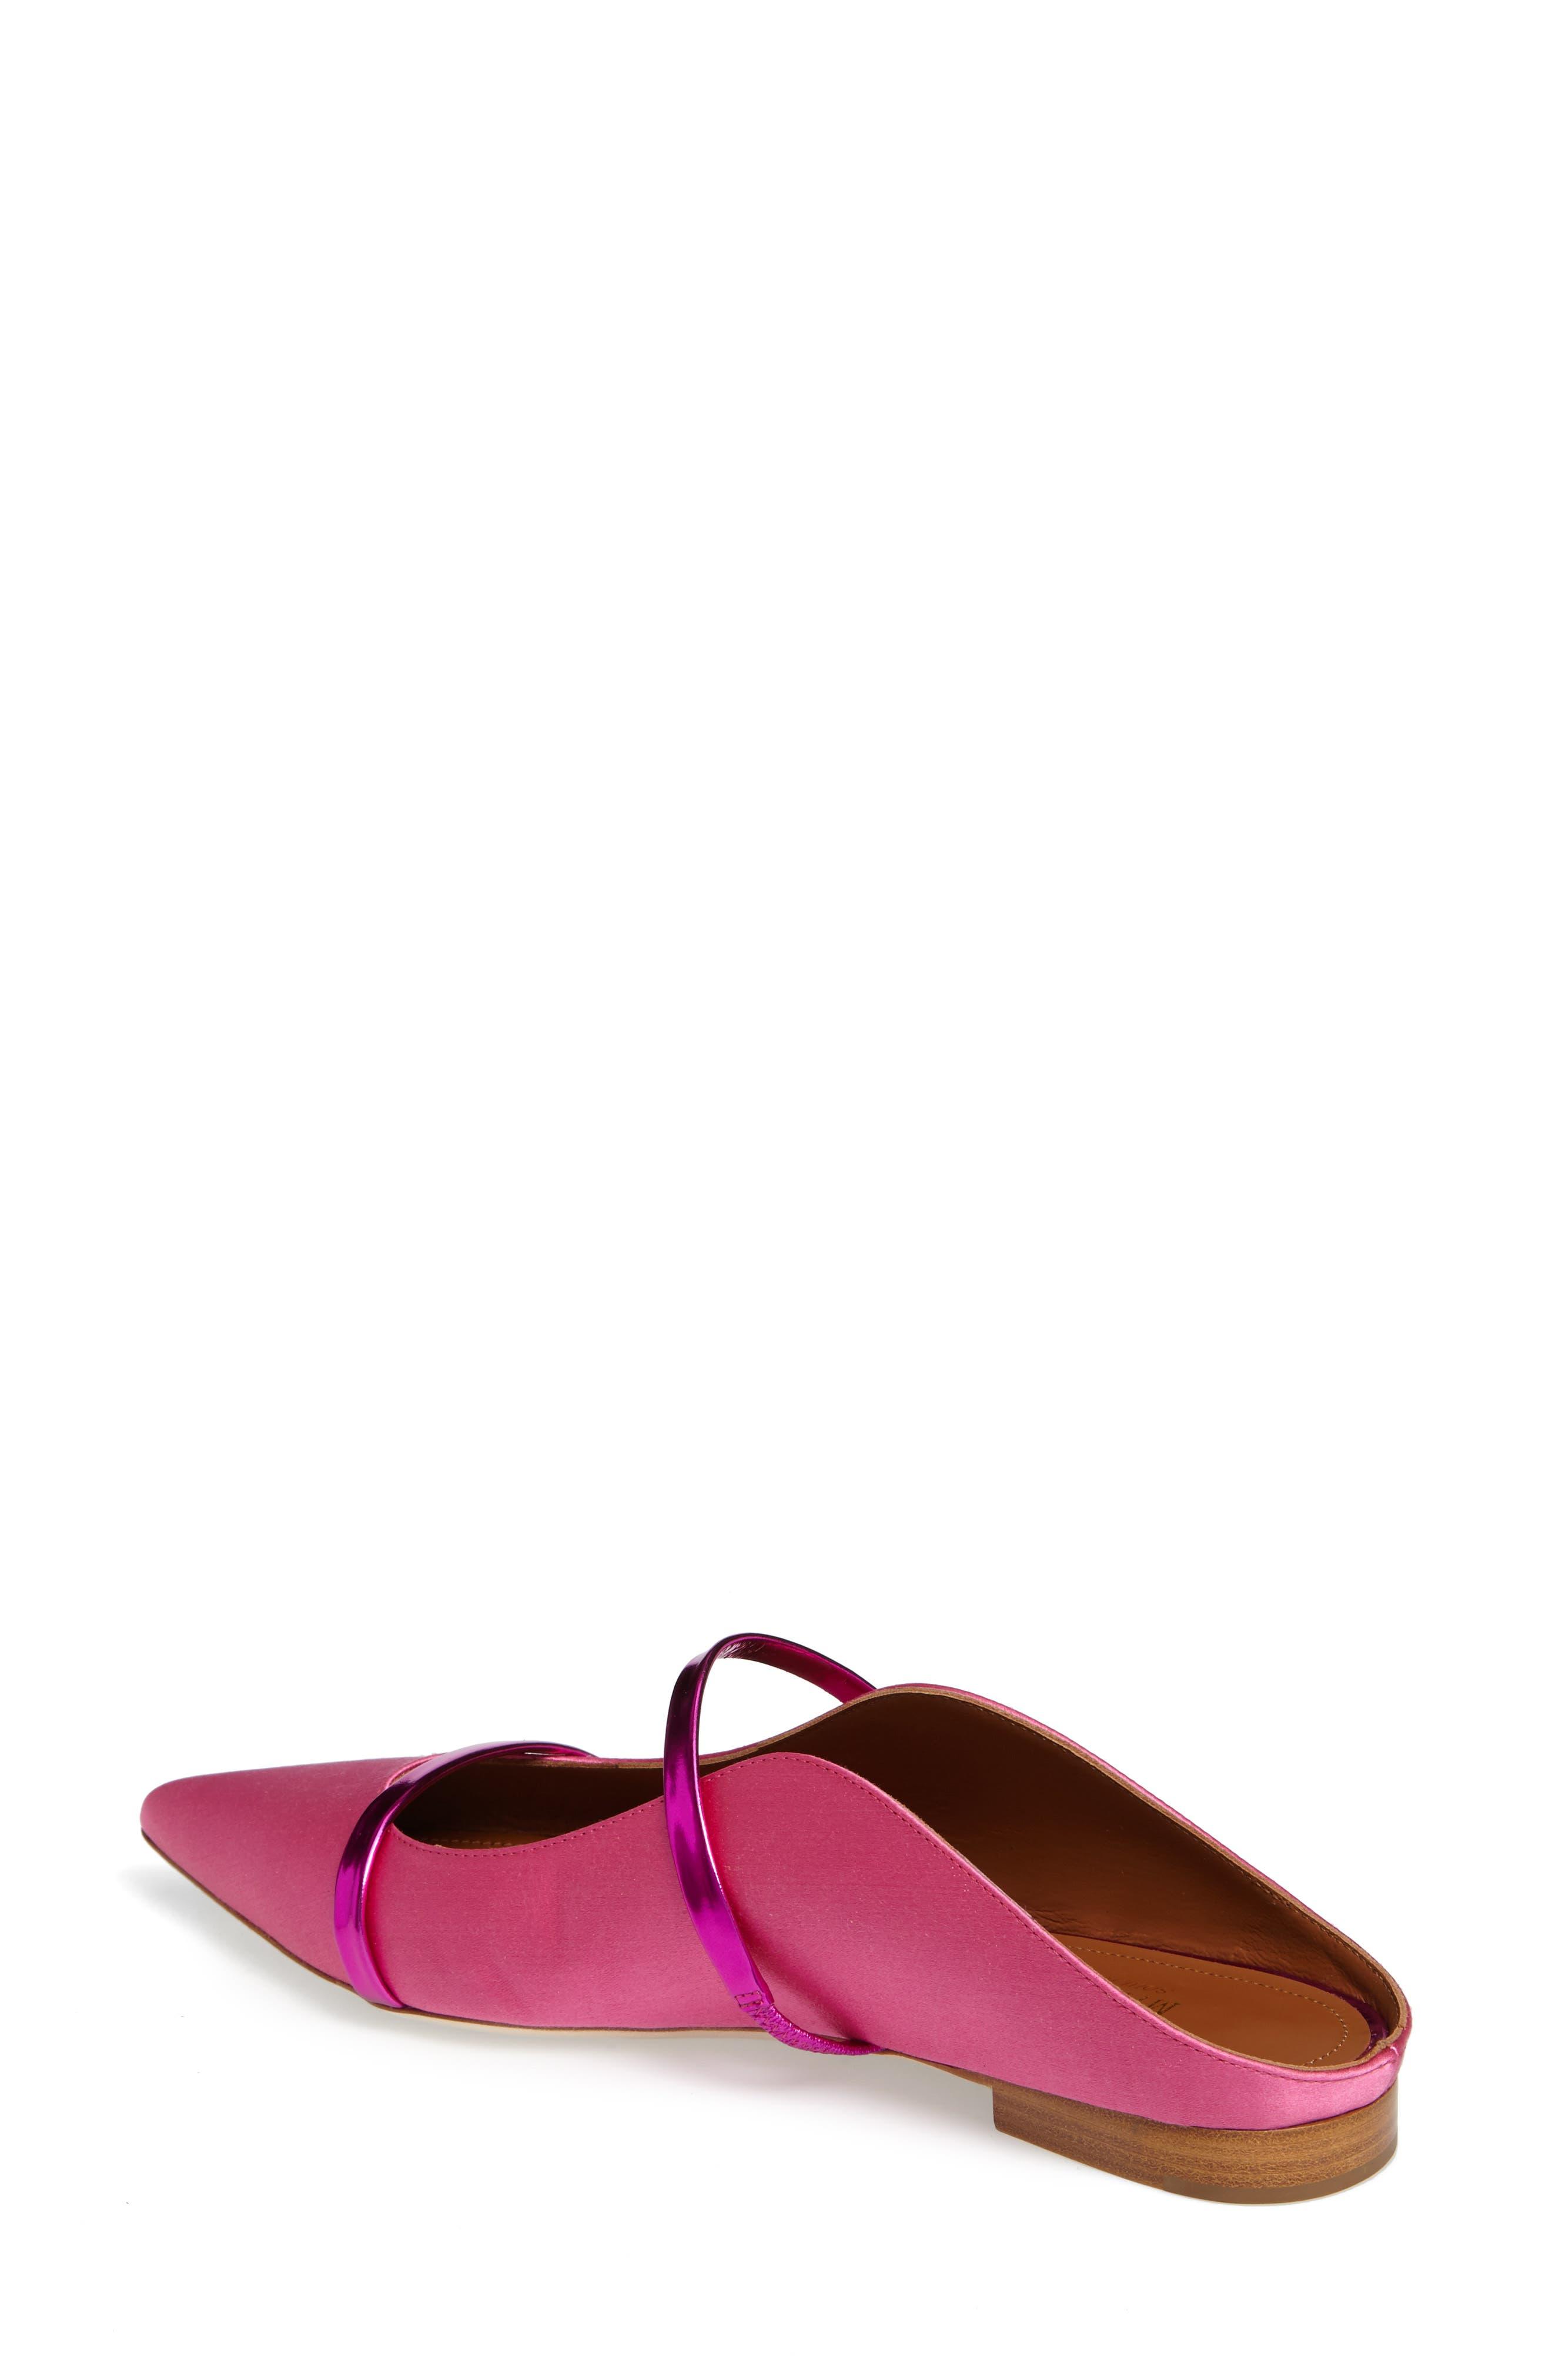 Alternate Image 2  - Malone Souliers Maureen Pointy Toe Flat (Women)